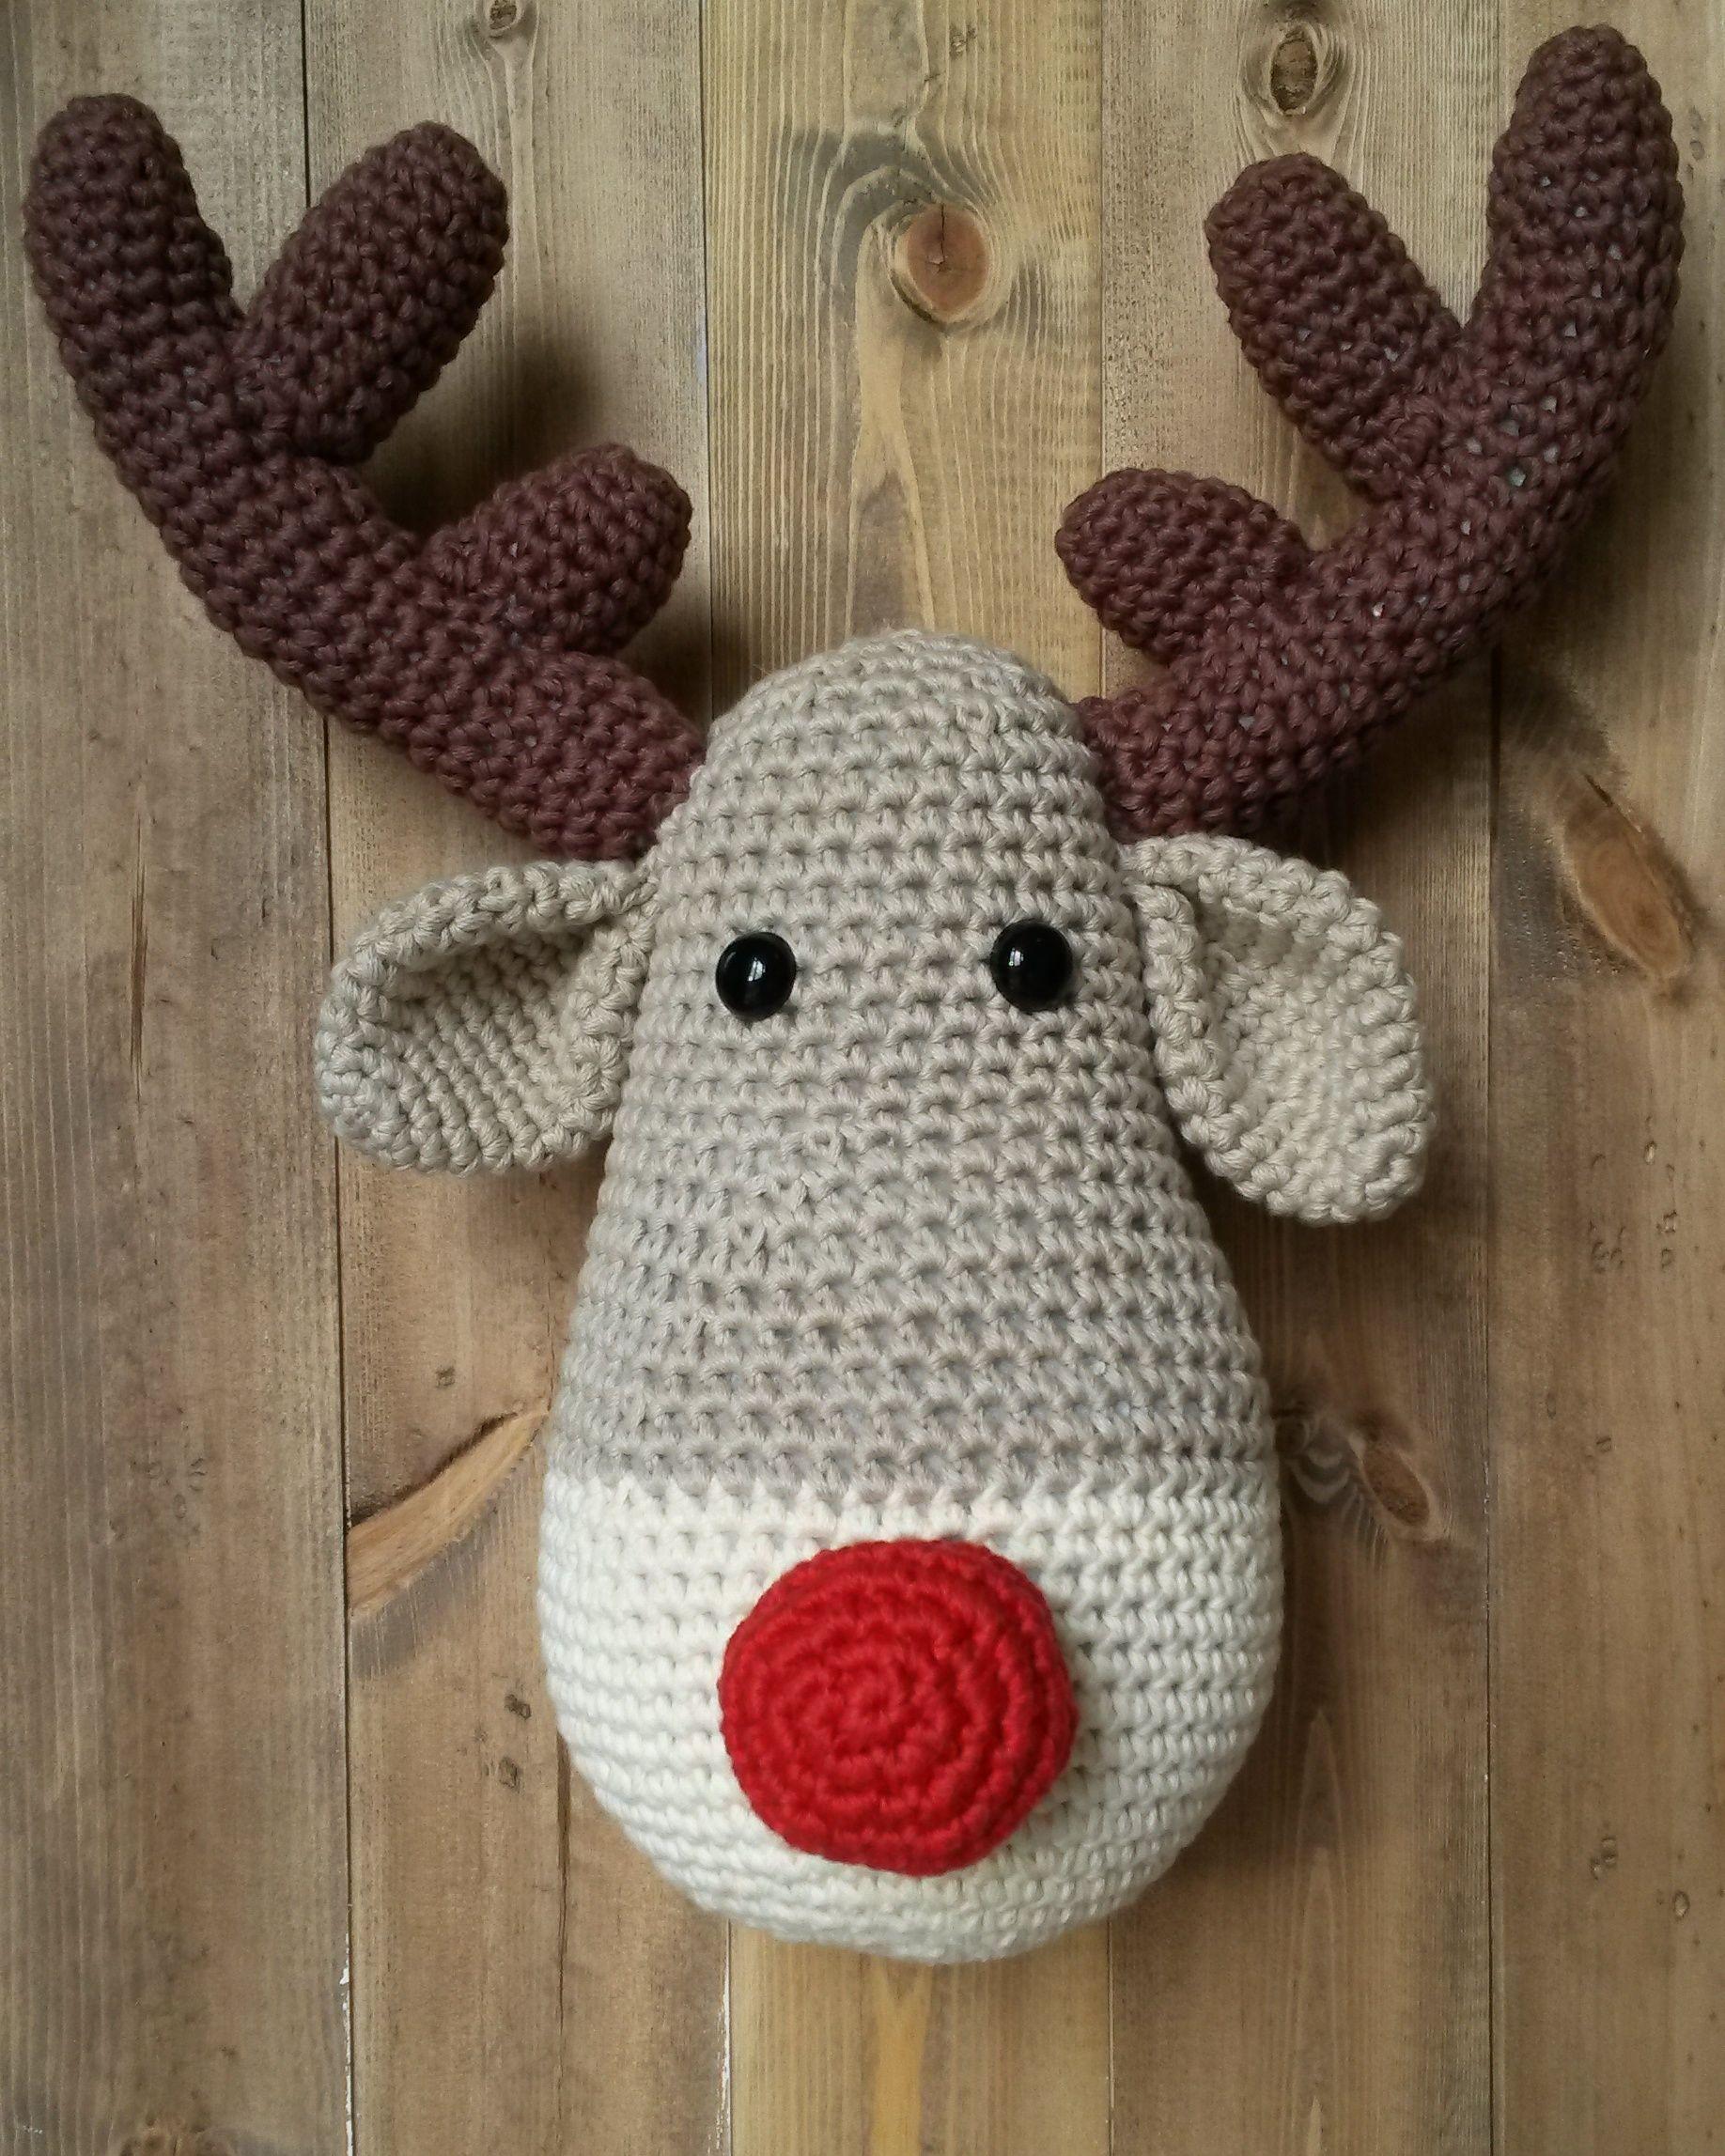 Crochet rudolph the red nose reindeer trophy head httpswww crochet rudolph the red nose reindeer trophy head httpsinstagram bankloansurffo Choice Image